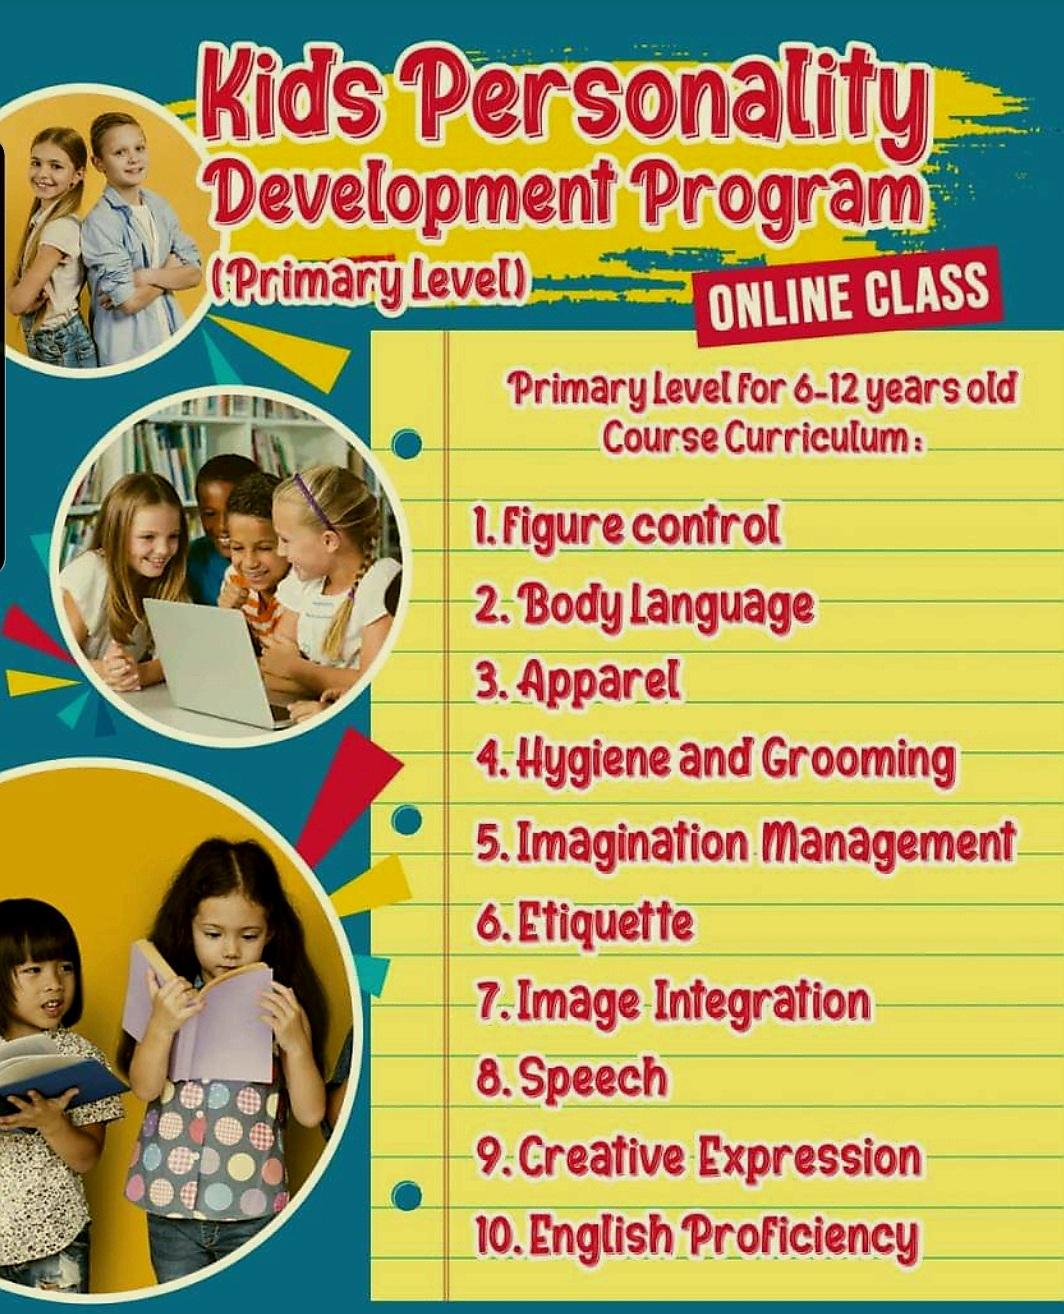 KIDS Personality Development Program By F.I.G. Image Gateway